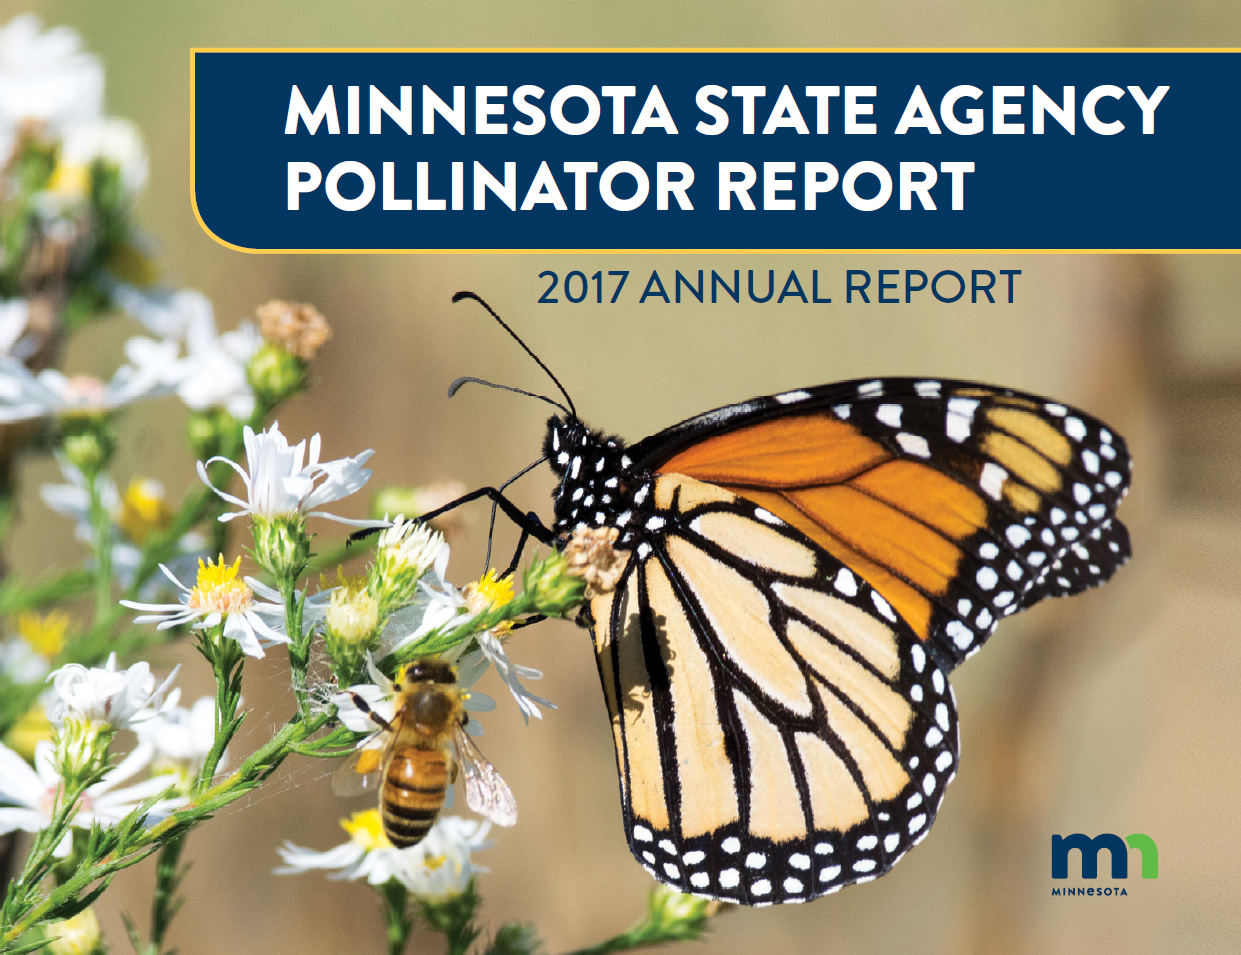 Minnesota State Agency Pollinator Report 2017